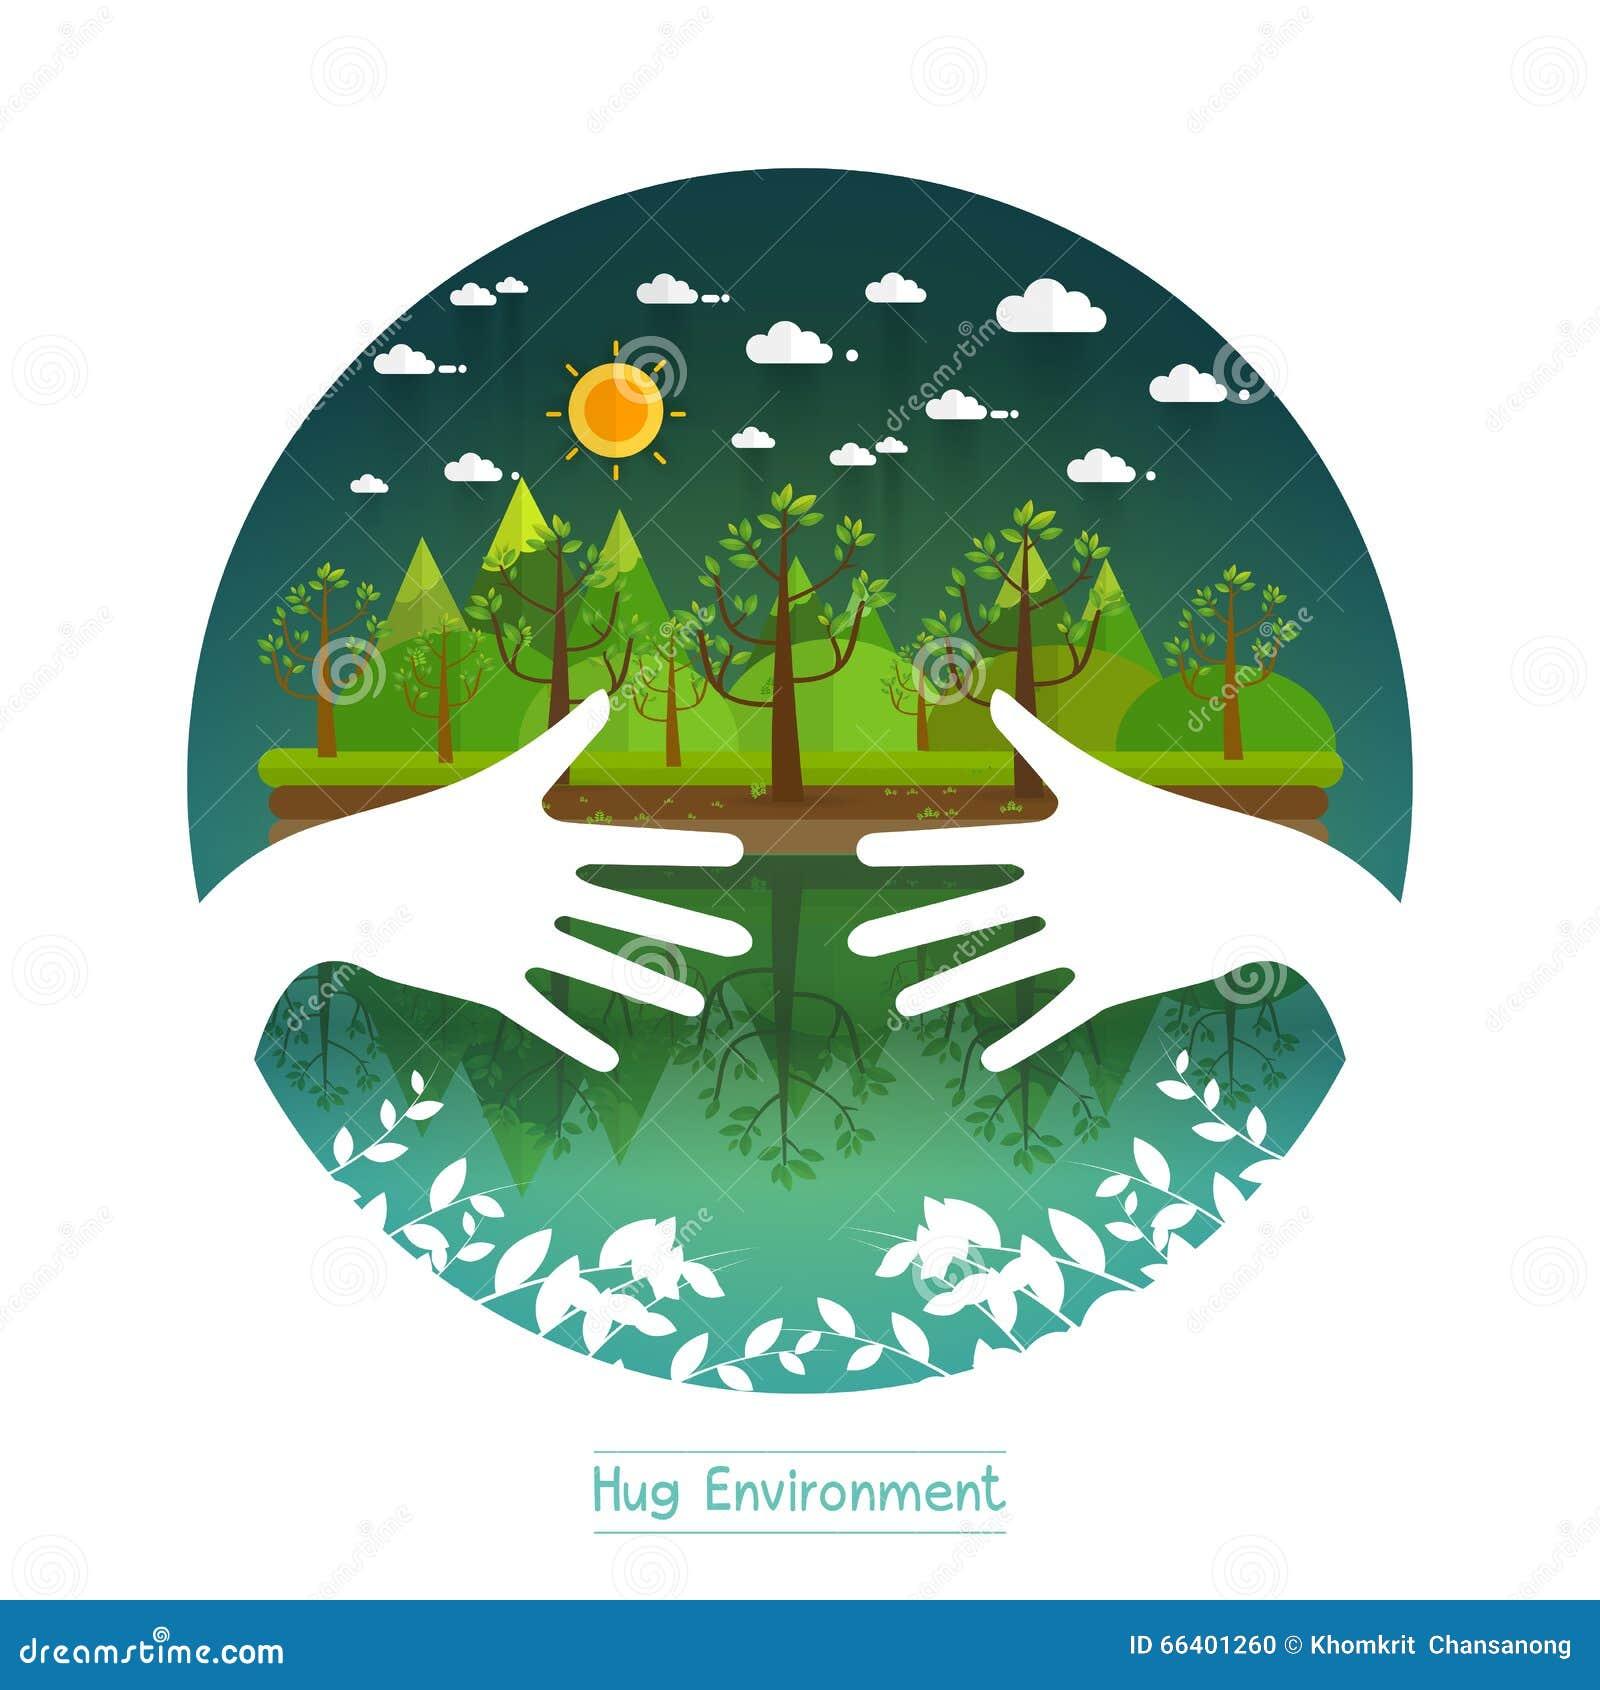 Environmental Concept Earthfriendly Landscapes: Eco Friendly Hands Hug Concept Green Tree.Environmentally